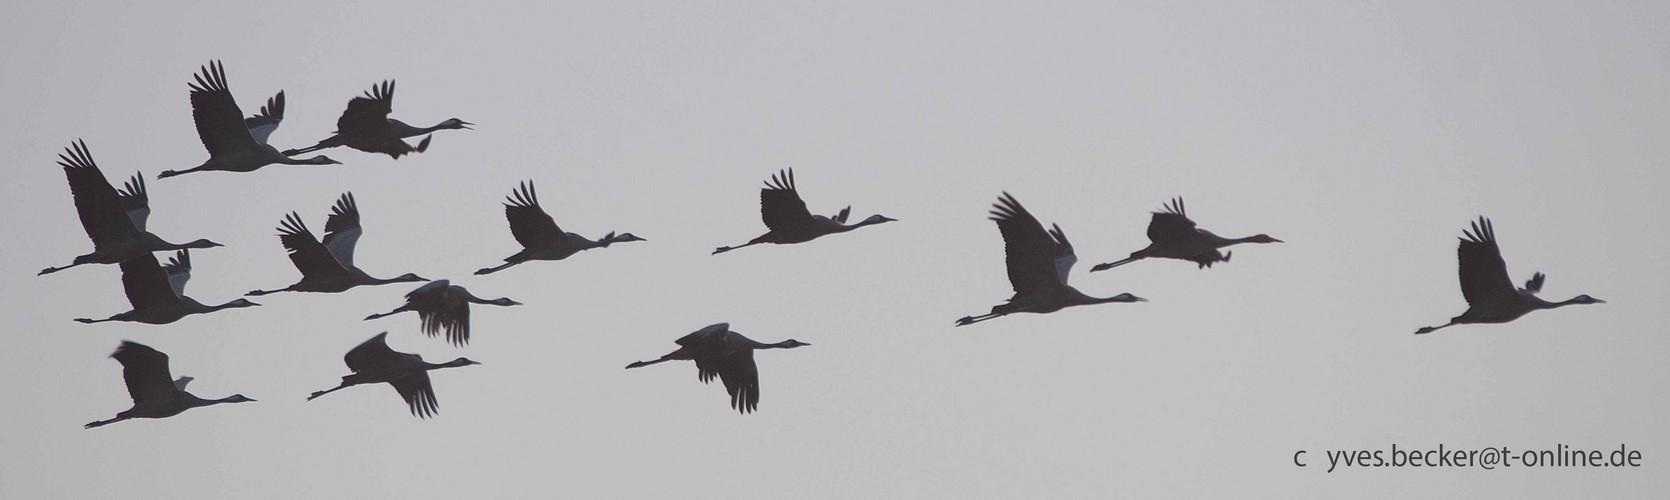 Kraniche am Darss - Morgenflug 4